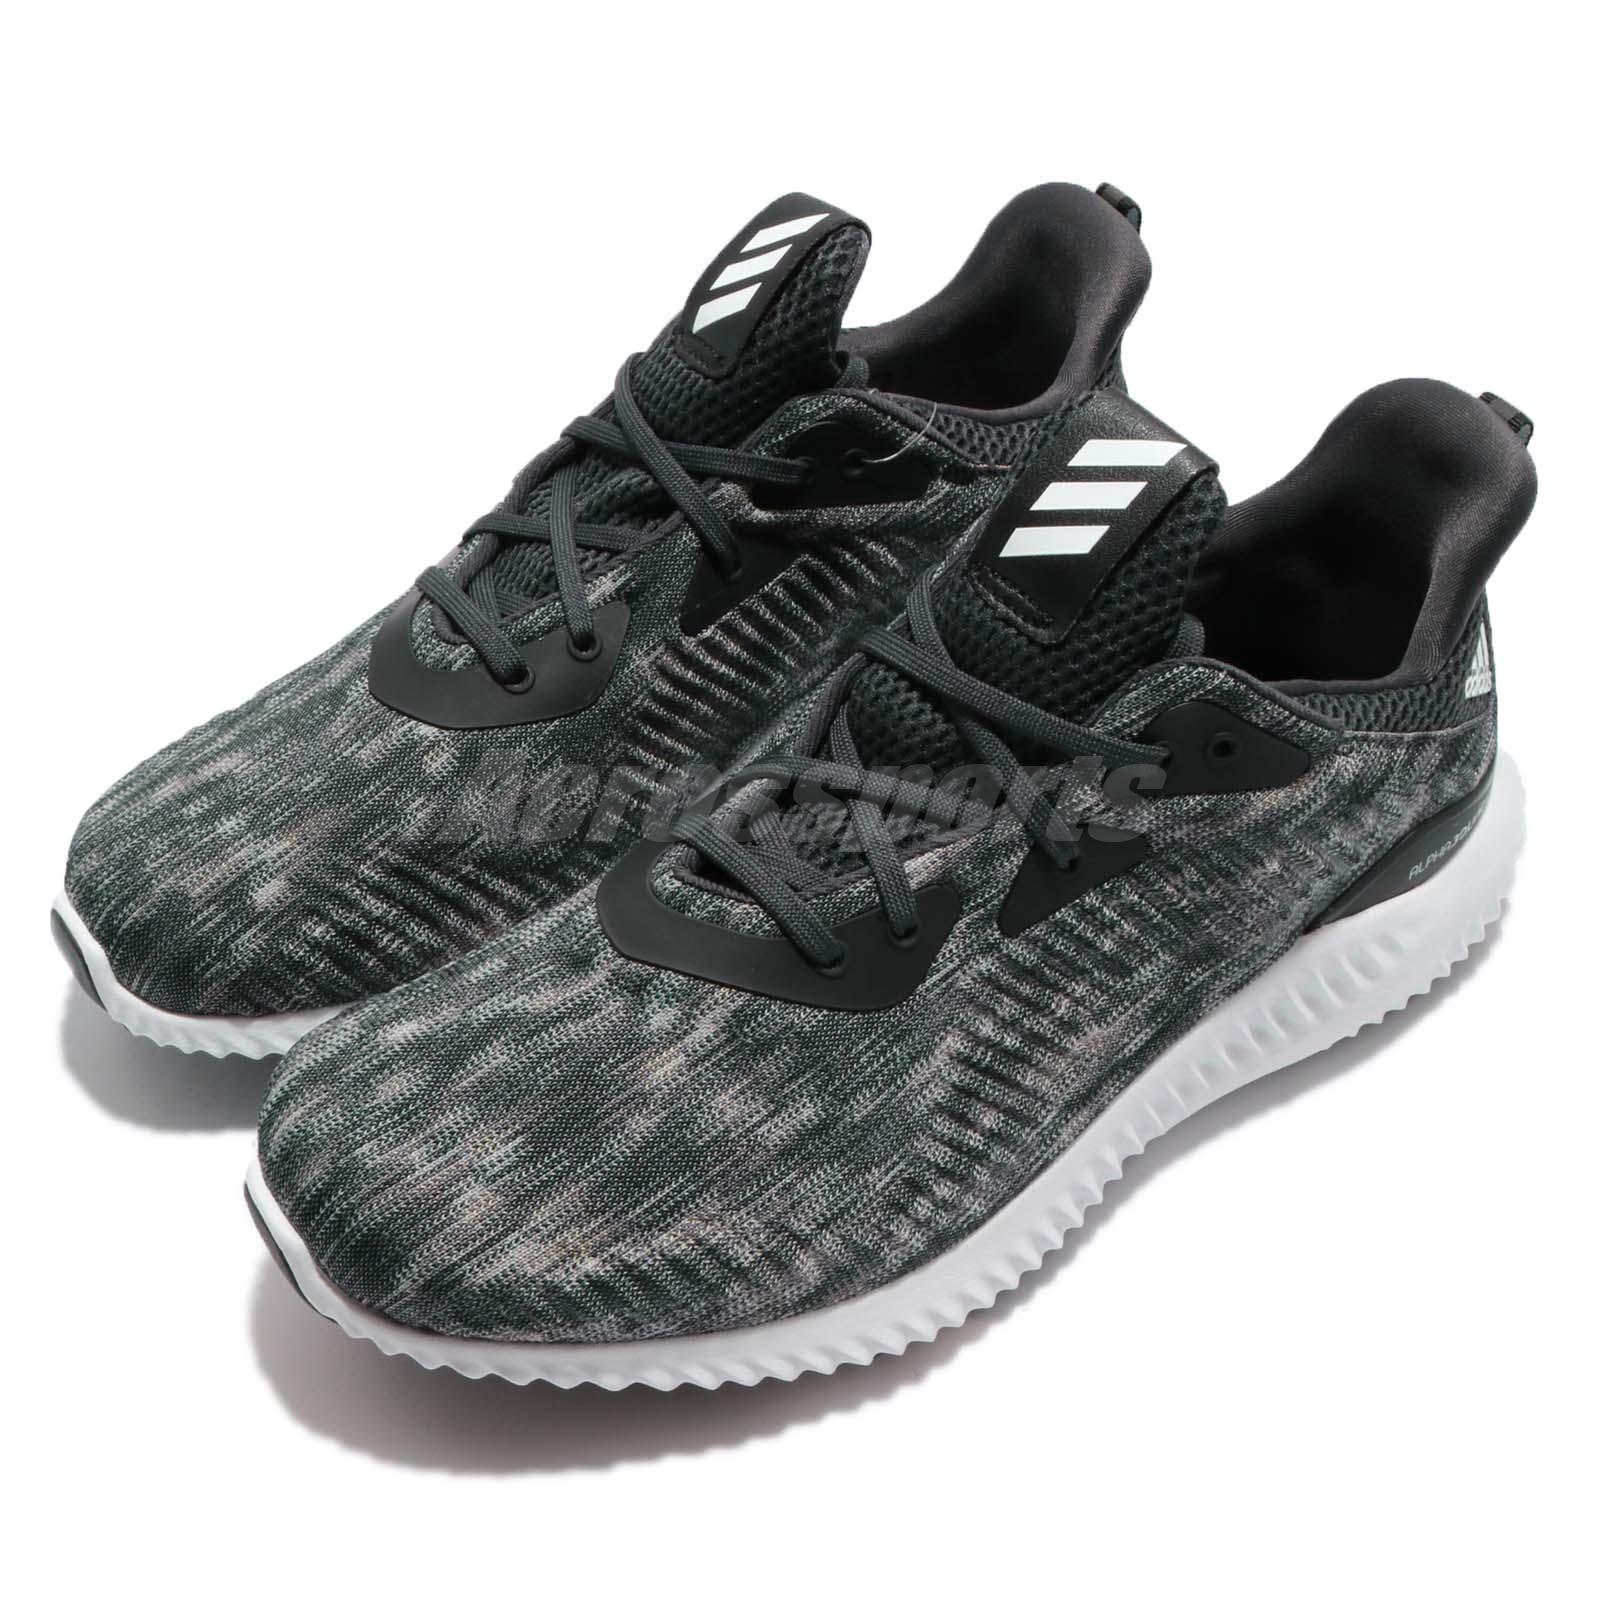 Adidas AlphaBounce SD m negro carbono hombres zapatos negro m blanco ddab83